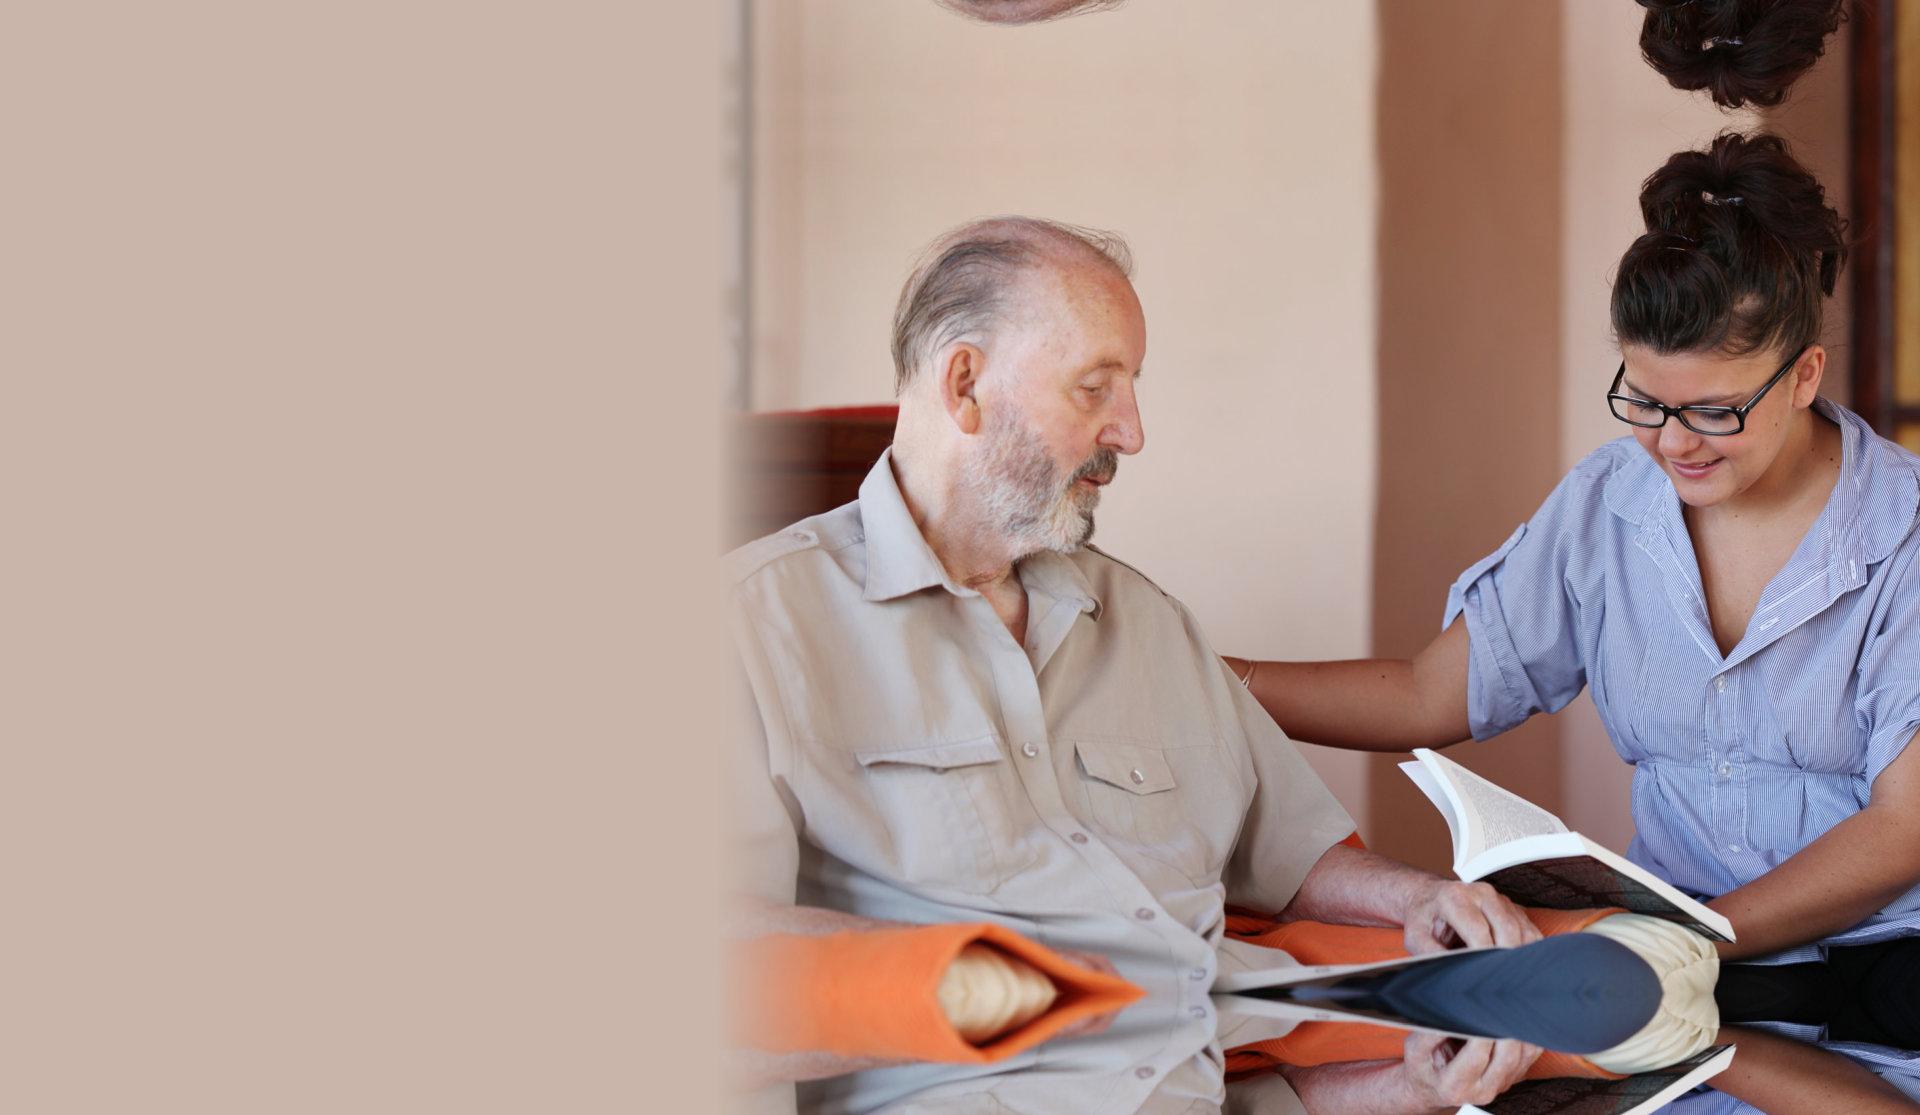 caretaker reads book to elder man